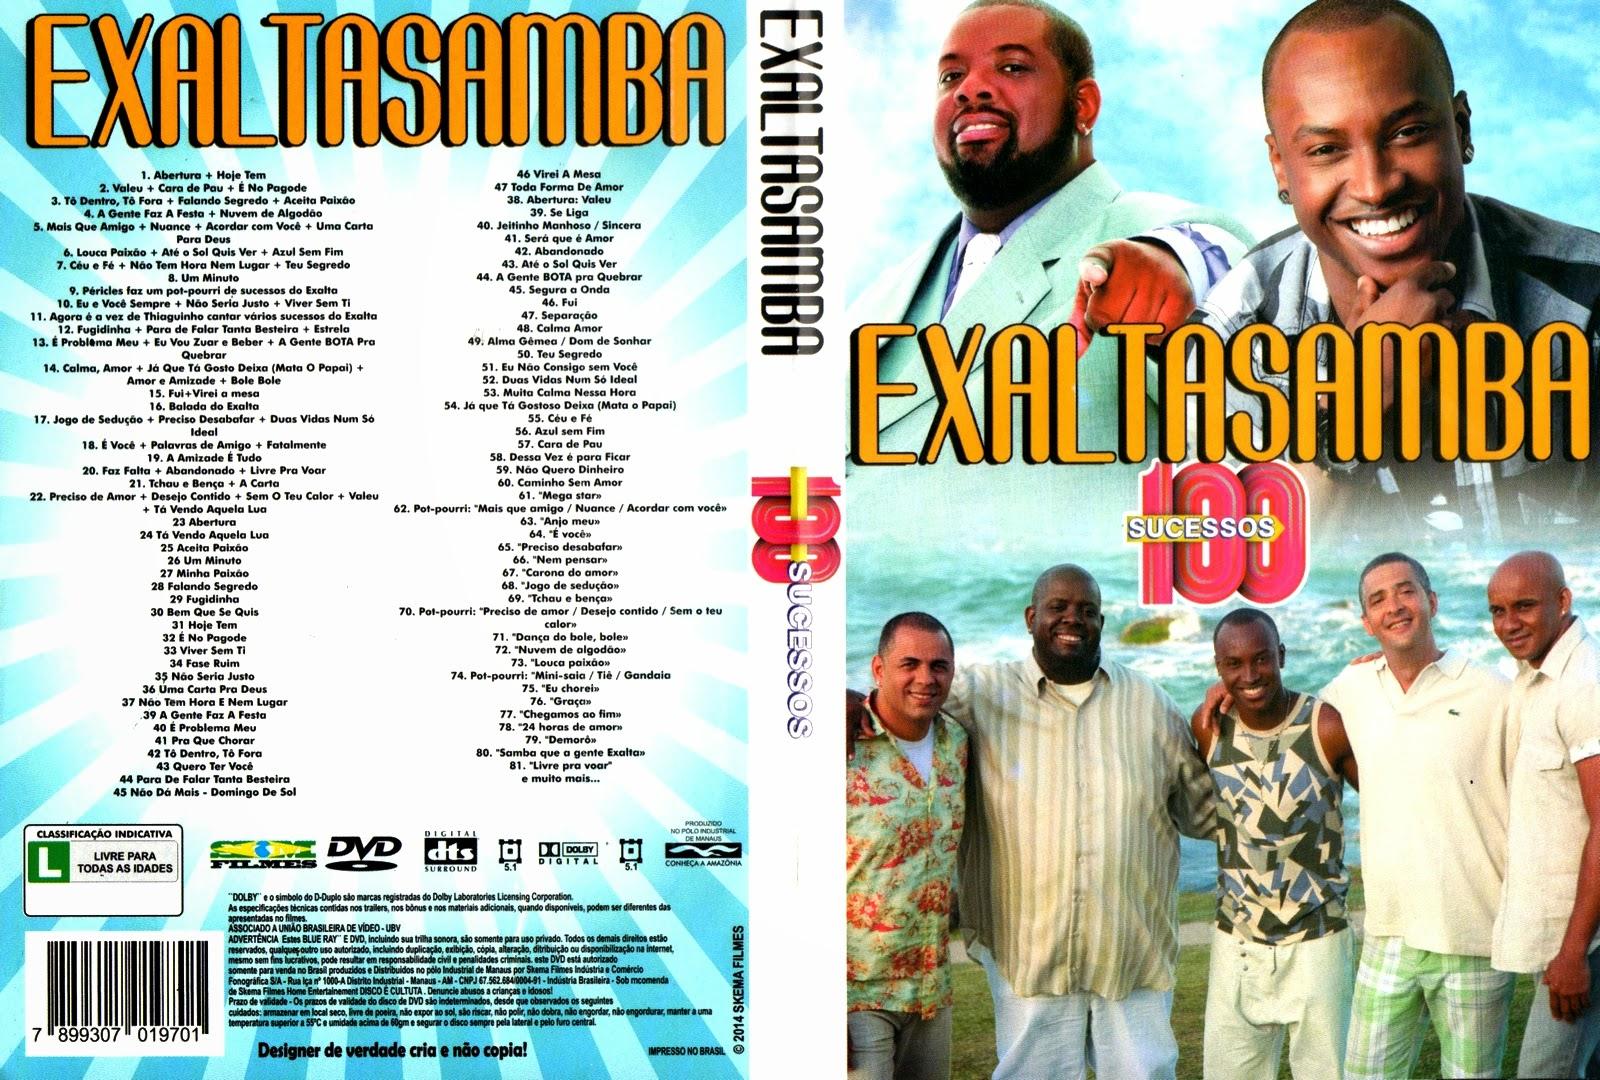 CAPAS X FILMES: EXALTA SAMBA 100 SUCESSOS